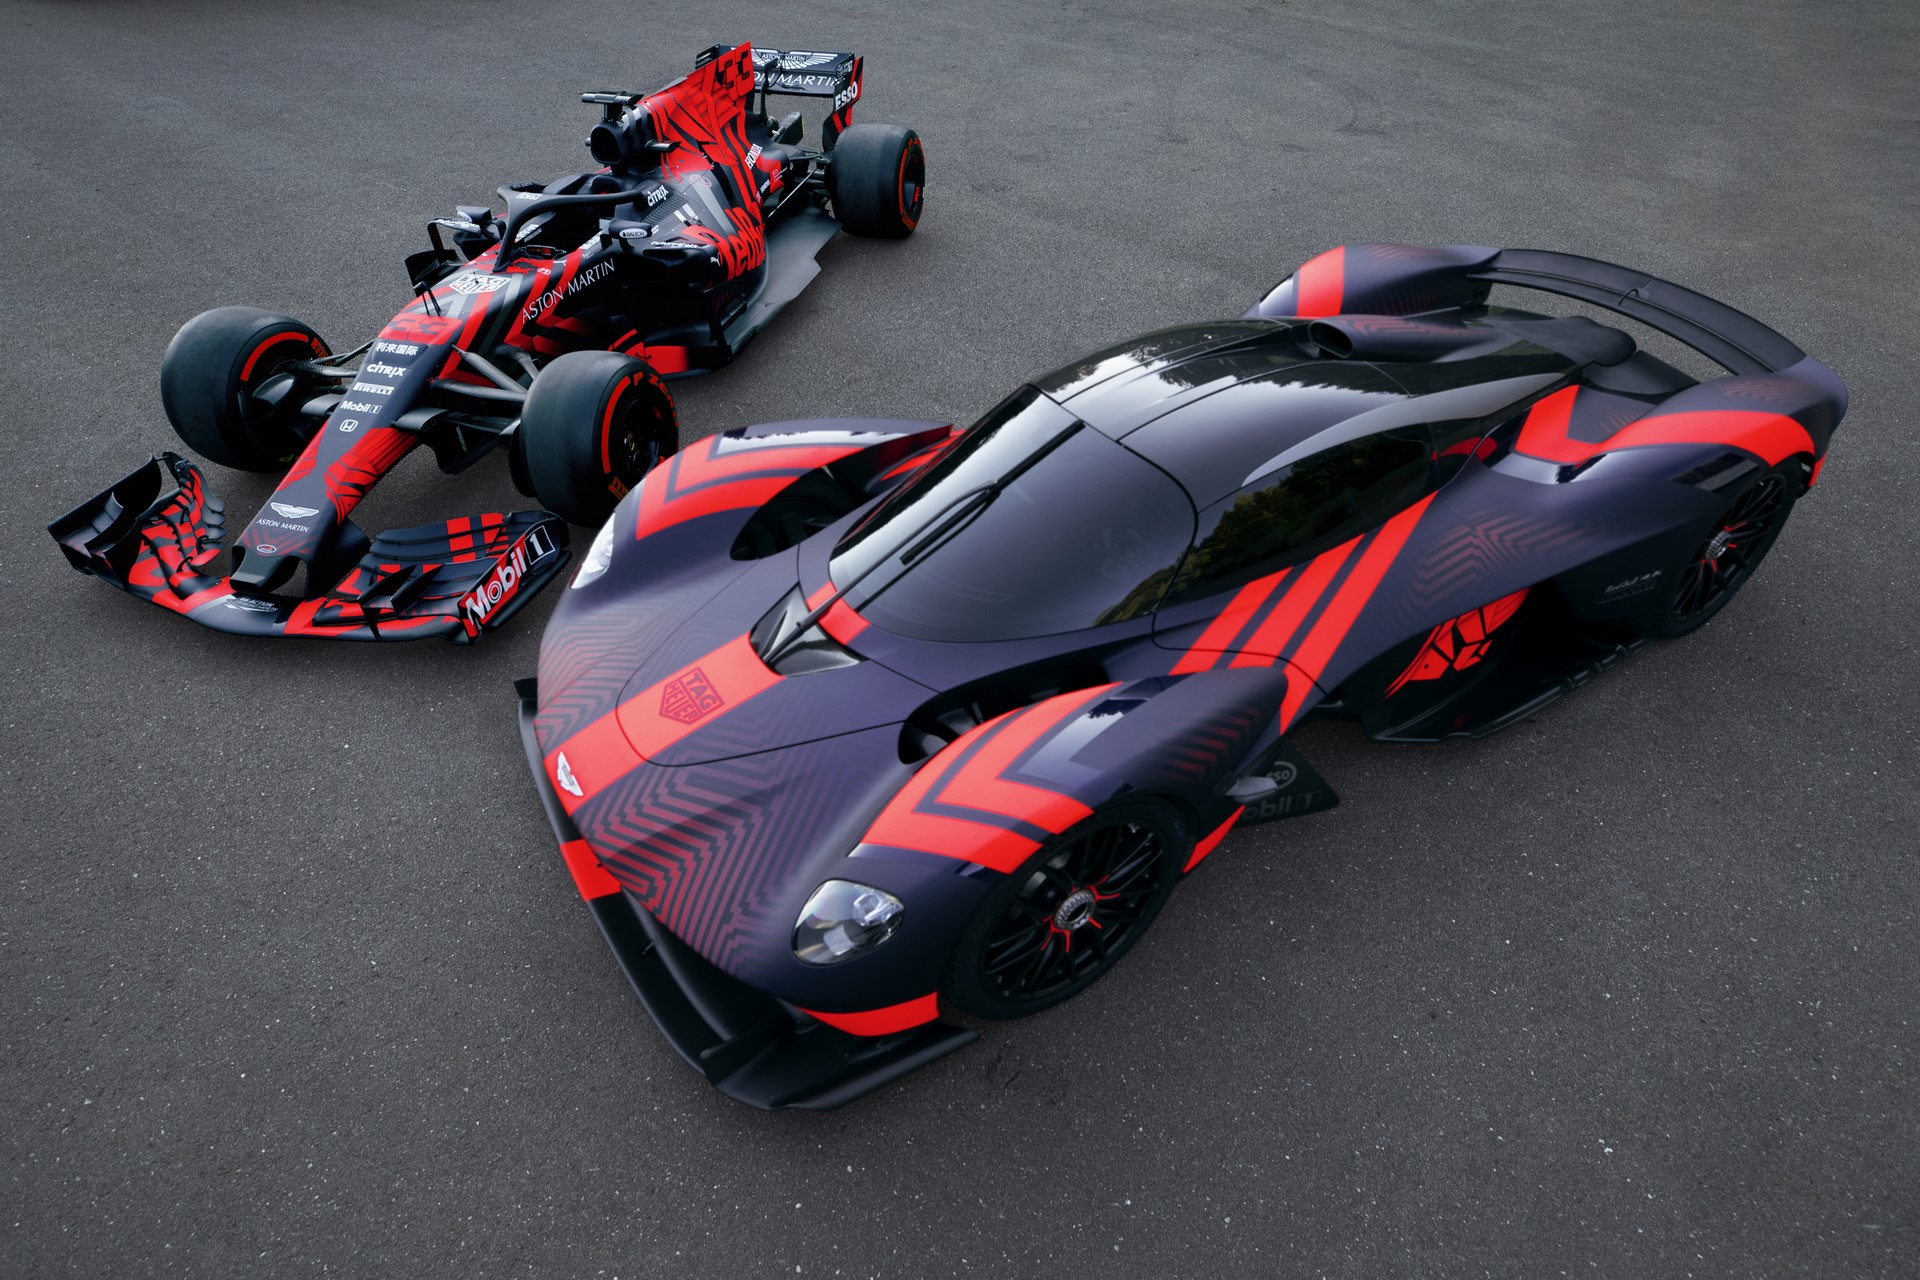 Aston-Martin-Valkyrie-at-Silverstone-5